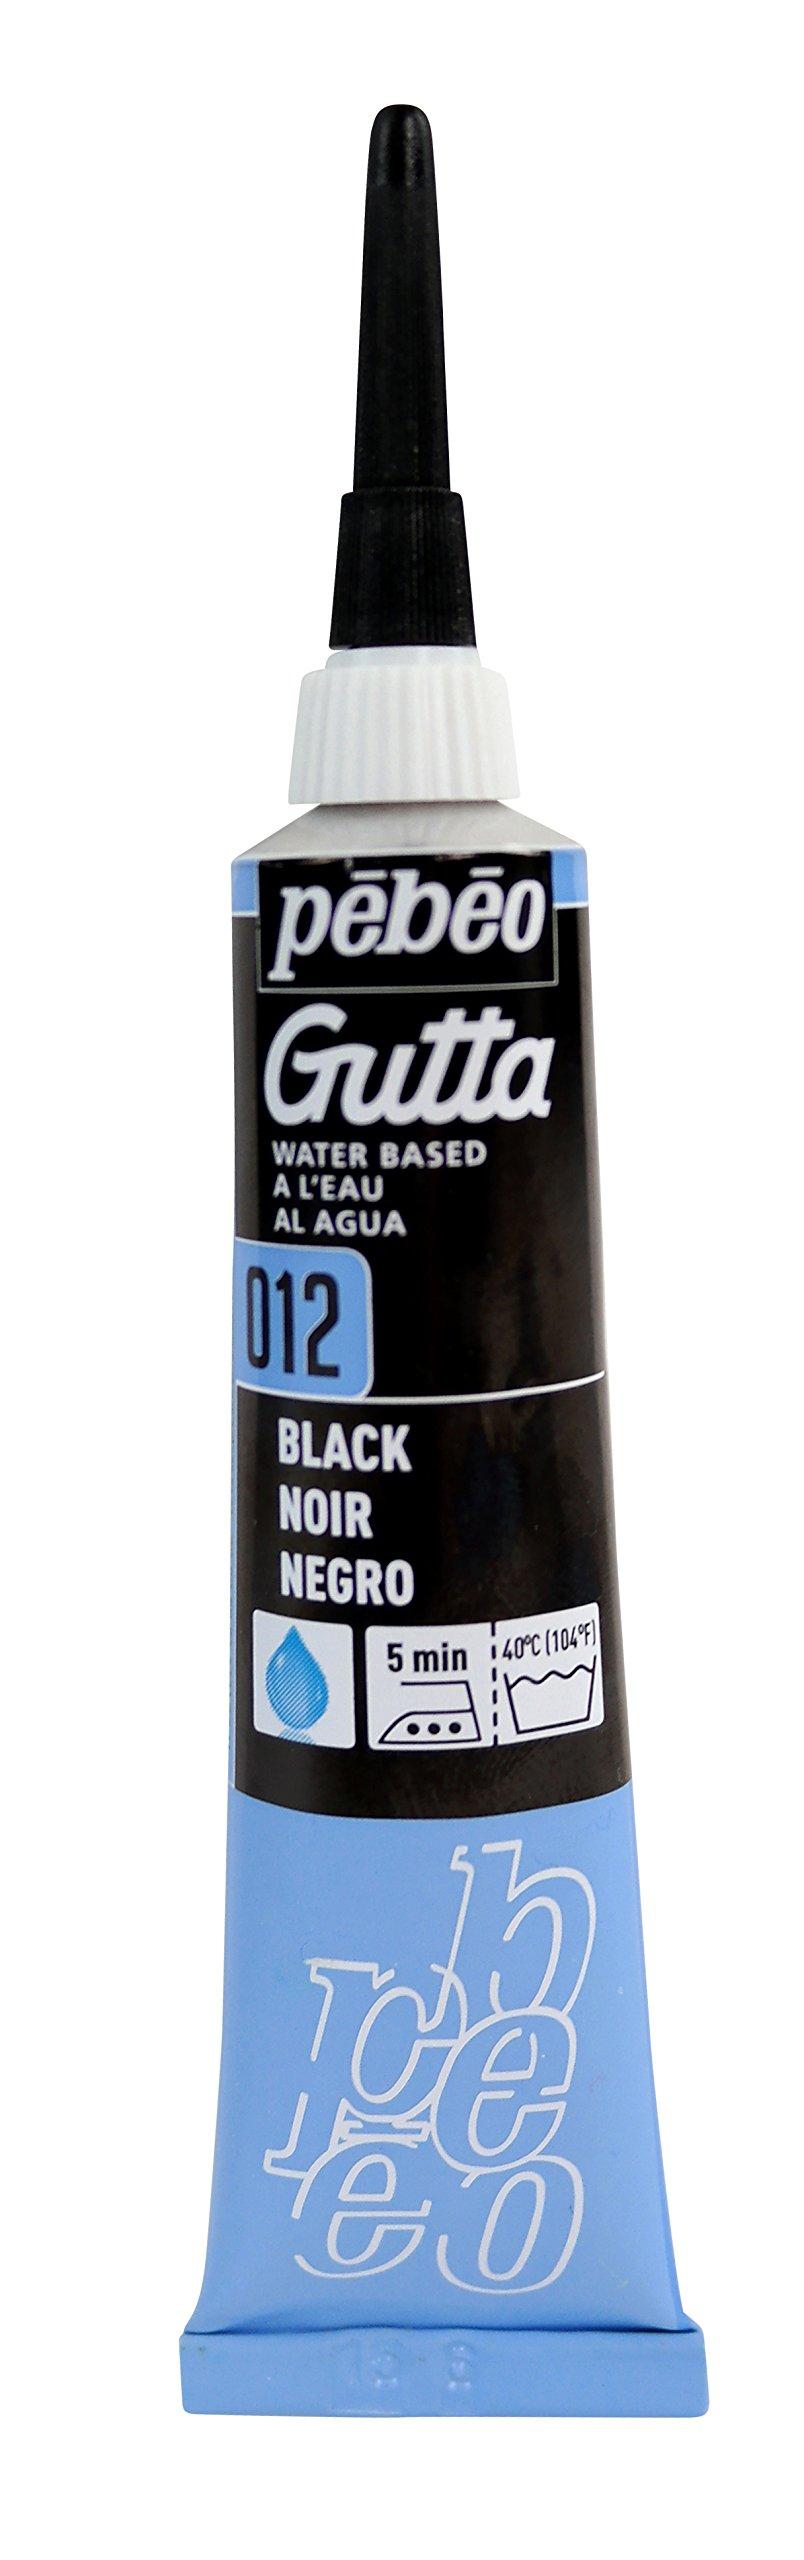 PEBEO Setasilk Silk Painting Water Based Gutta 20-Milliliter Tube, Black